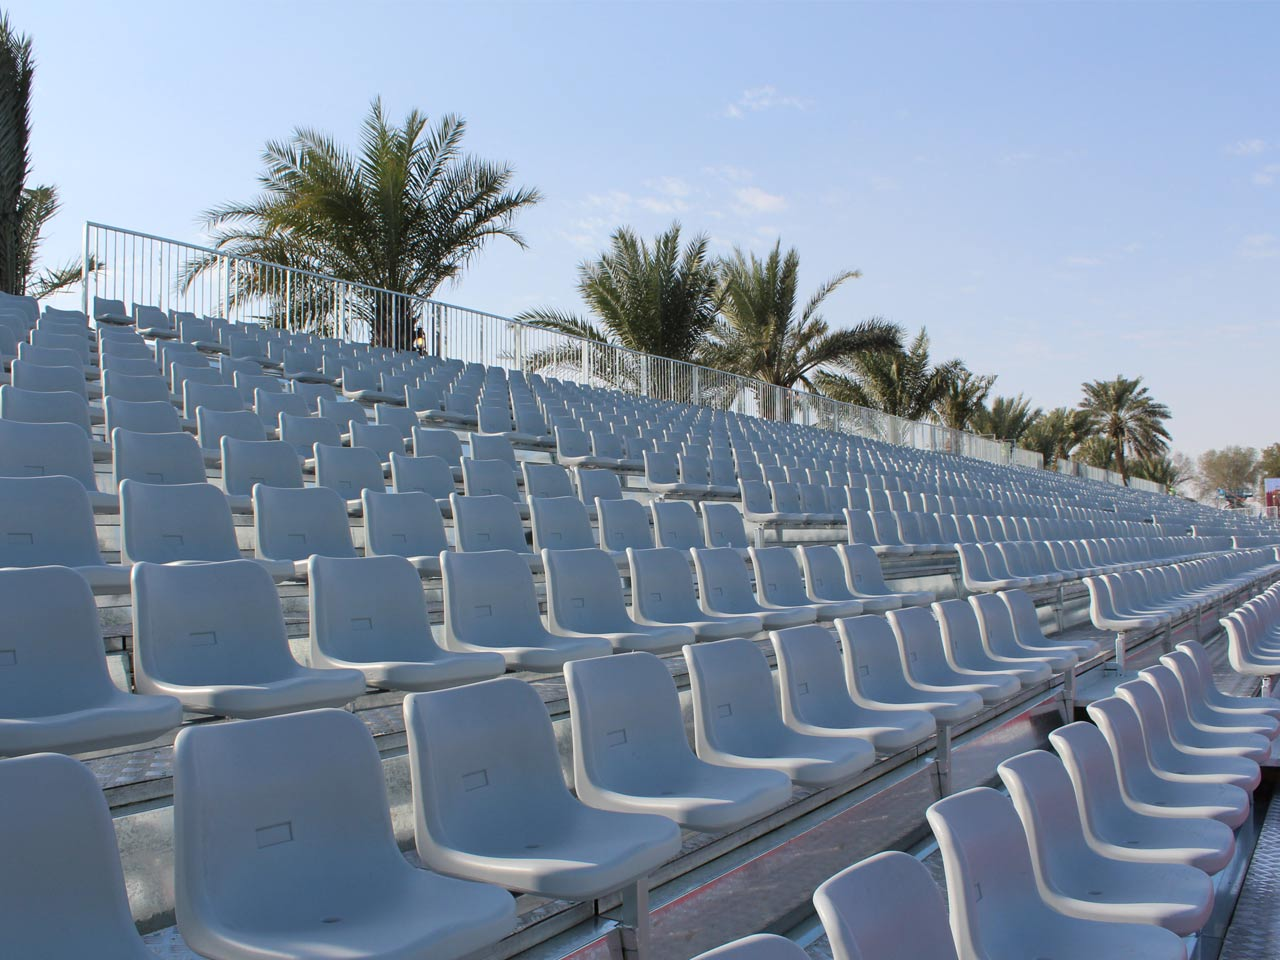 grandstand-seats-events-setup-rental-stadium-seating-sport-management-film-festival-seating-screening-f1-open-air-cinema-8